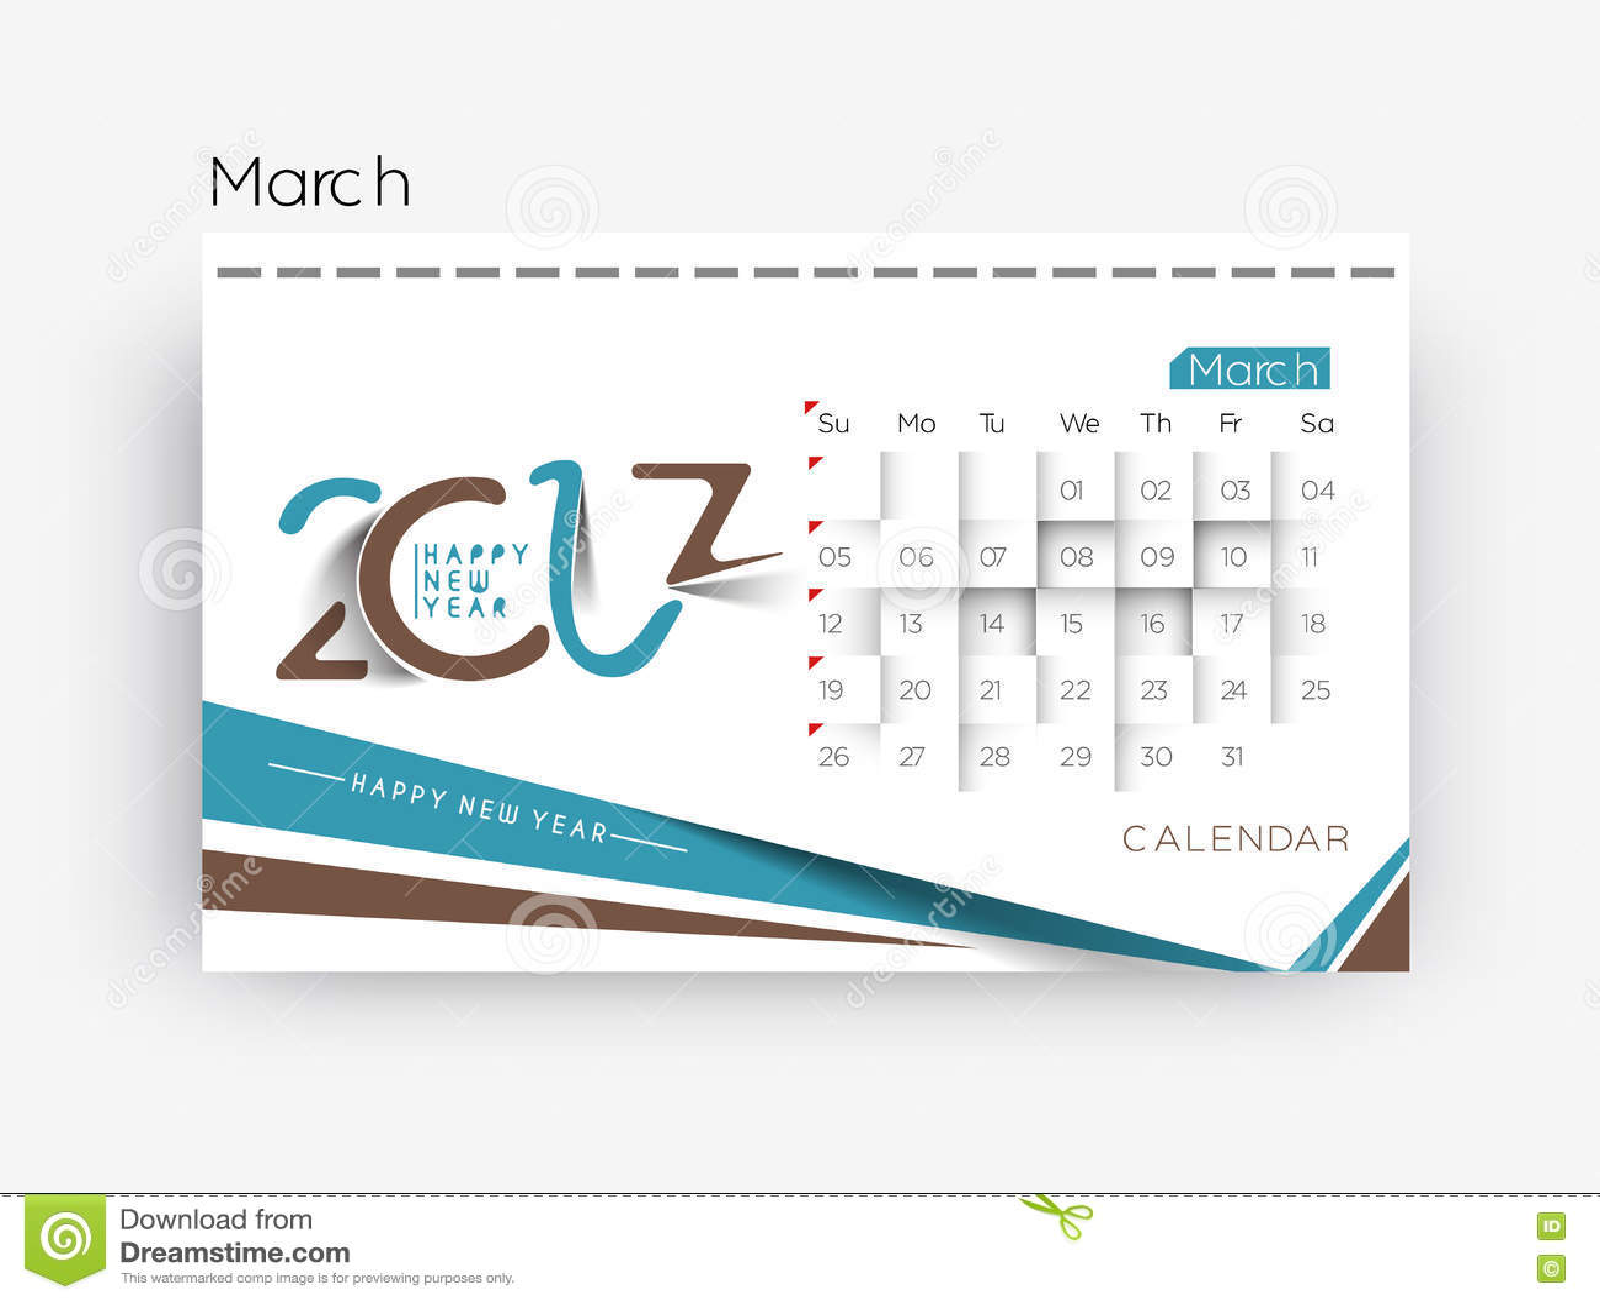 Year Calendar Design : Happy new year calendar design elements stock vector